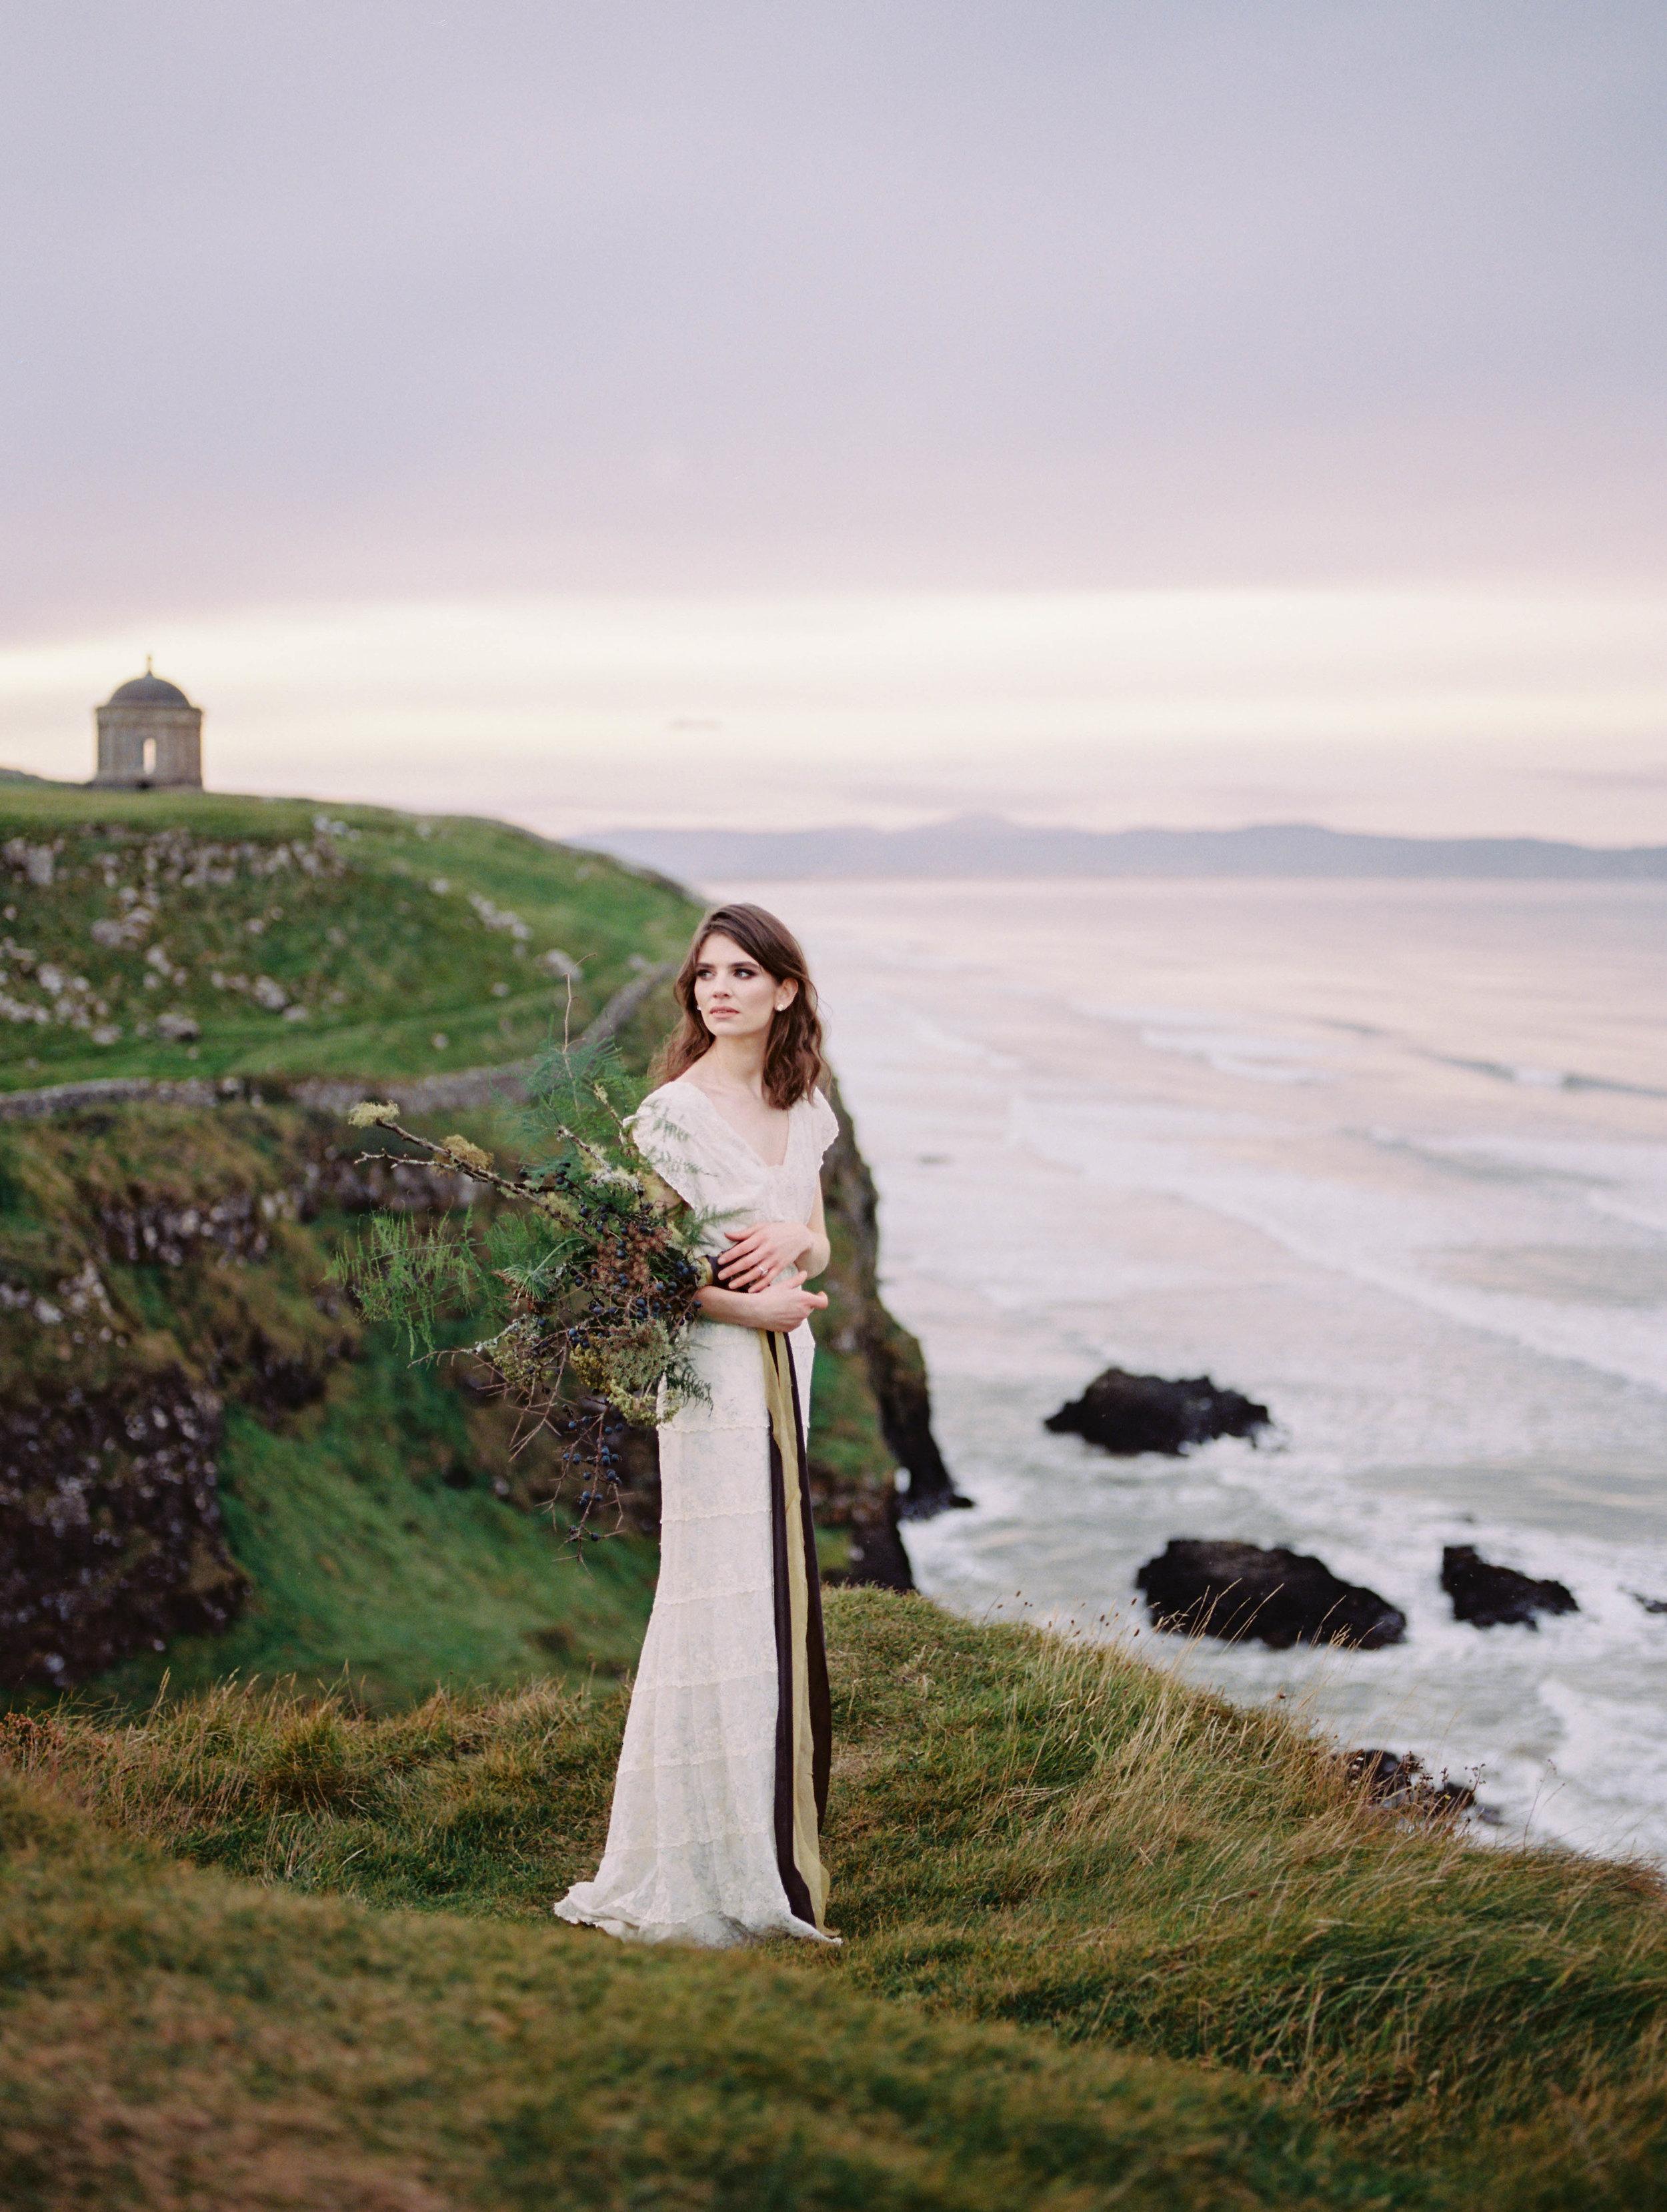 Eli Defaria Photography Northen Ireland Wedding Editorial Inspiration 2018 351.jpg